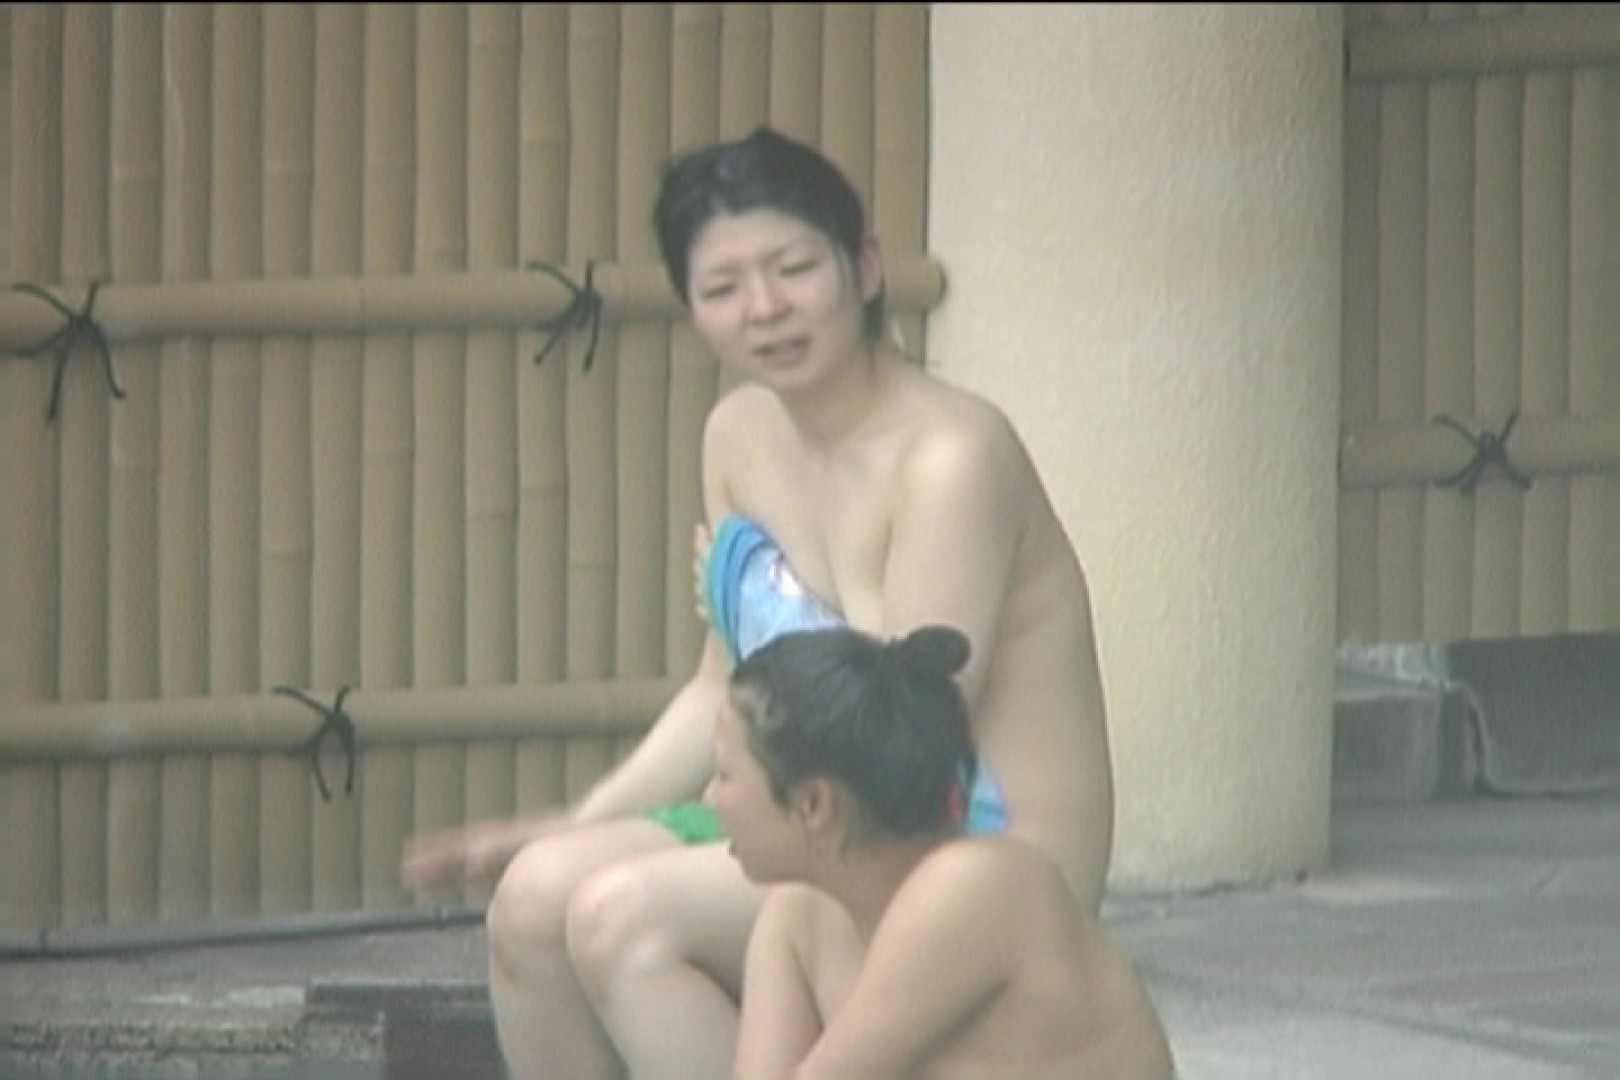 Aquaな露天風呂Vol.139 OLセックス  63画像 27